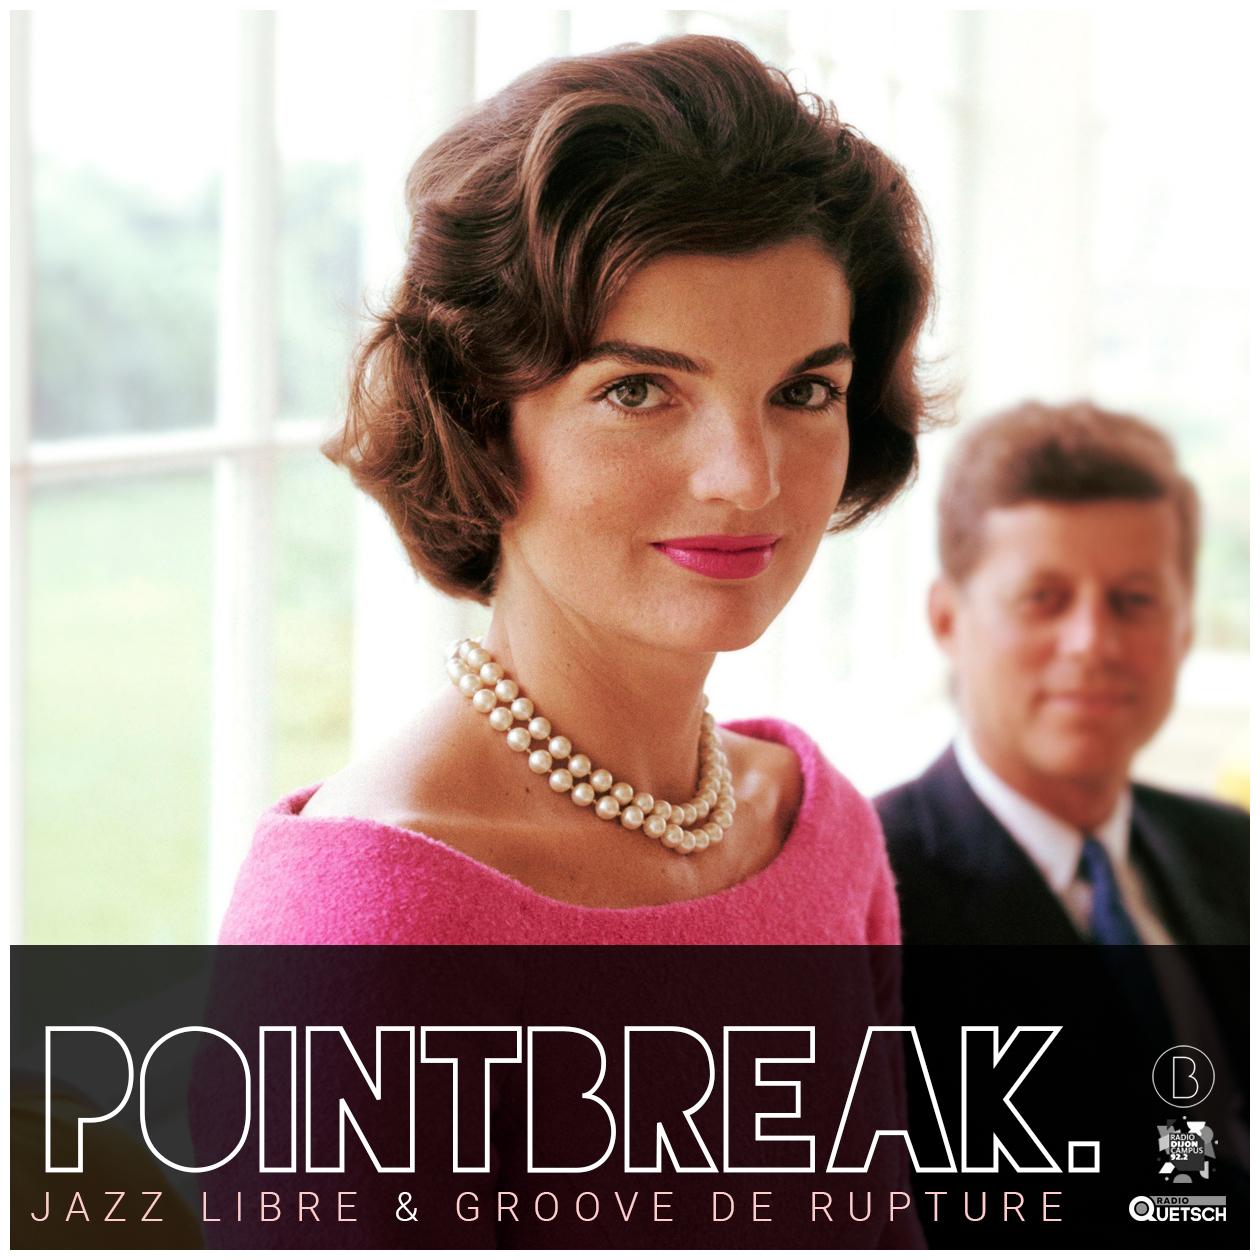 PointBreak, Radio Mix S03 E08